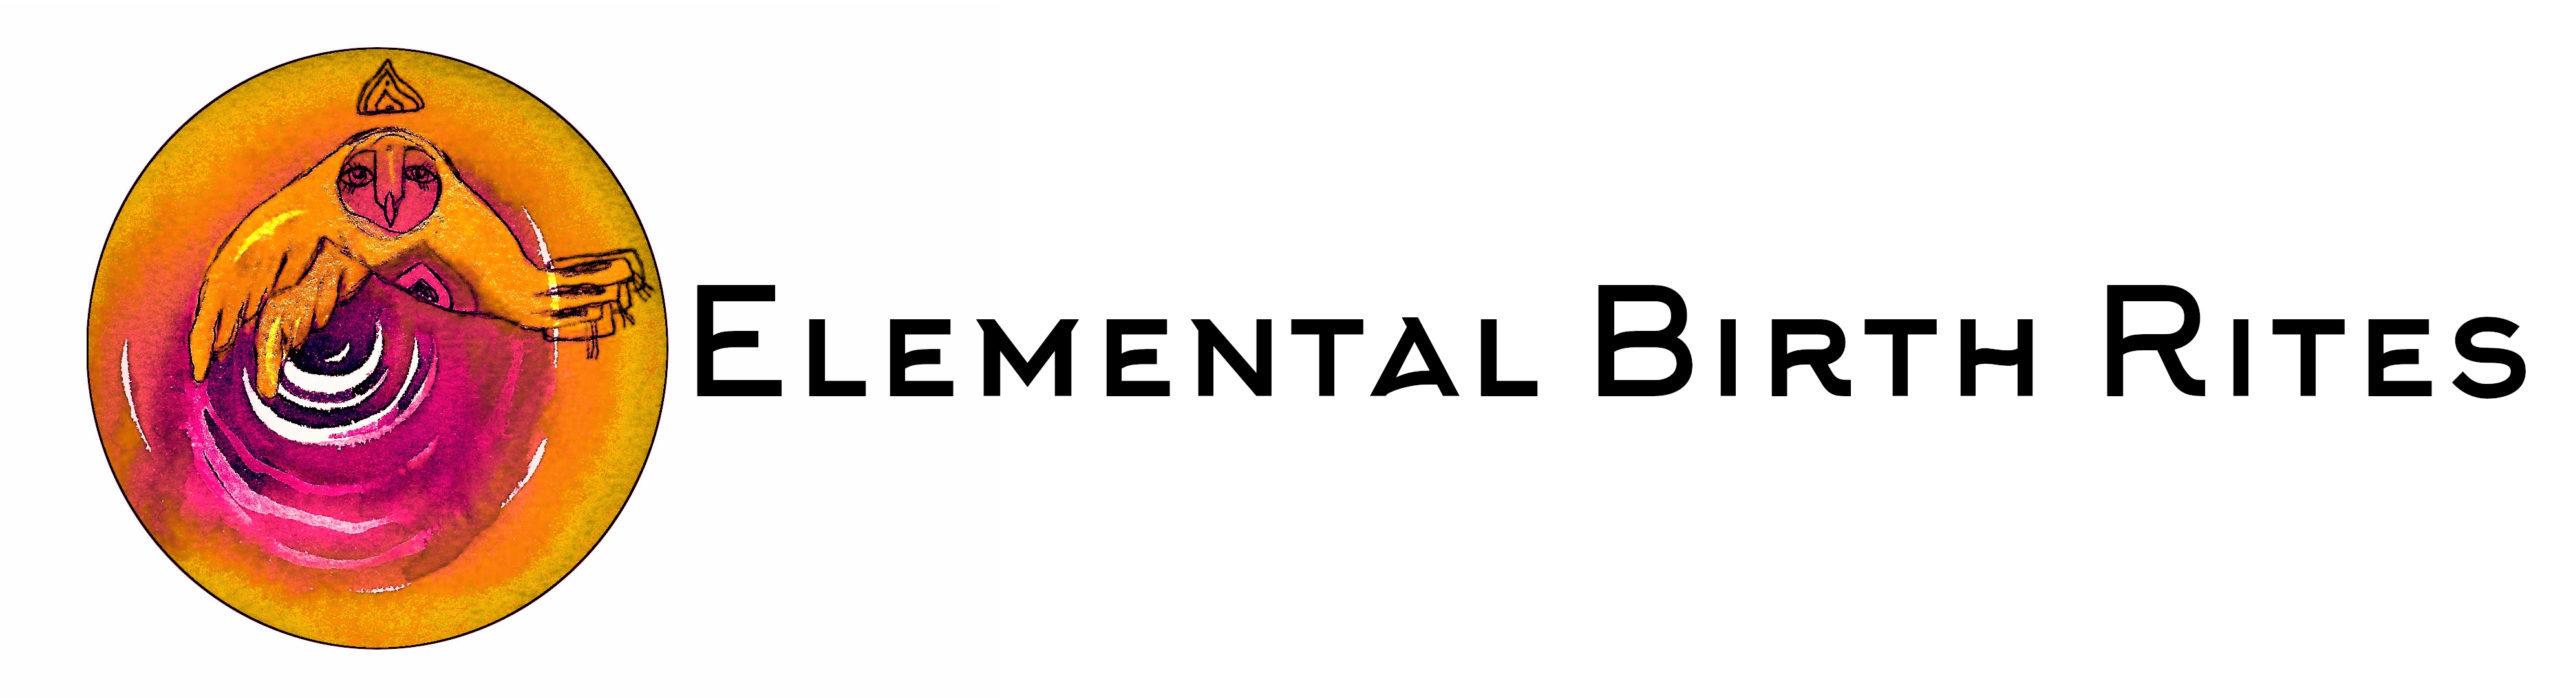 Elemental Birth Rites